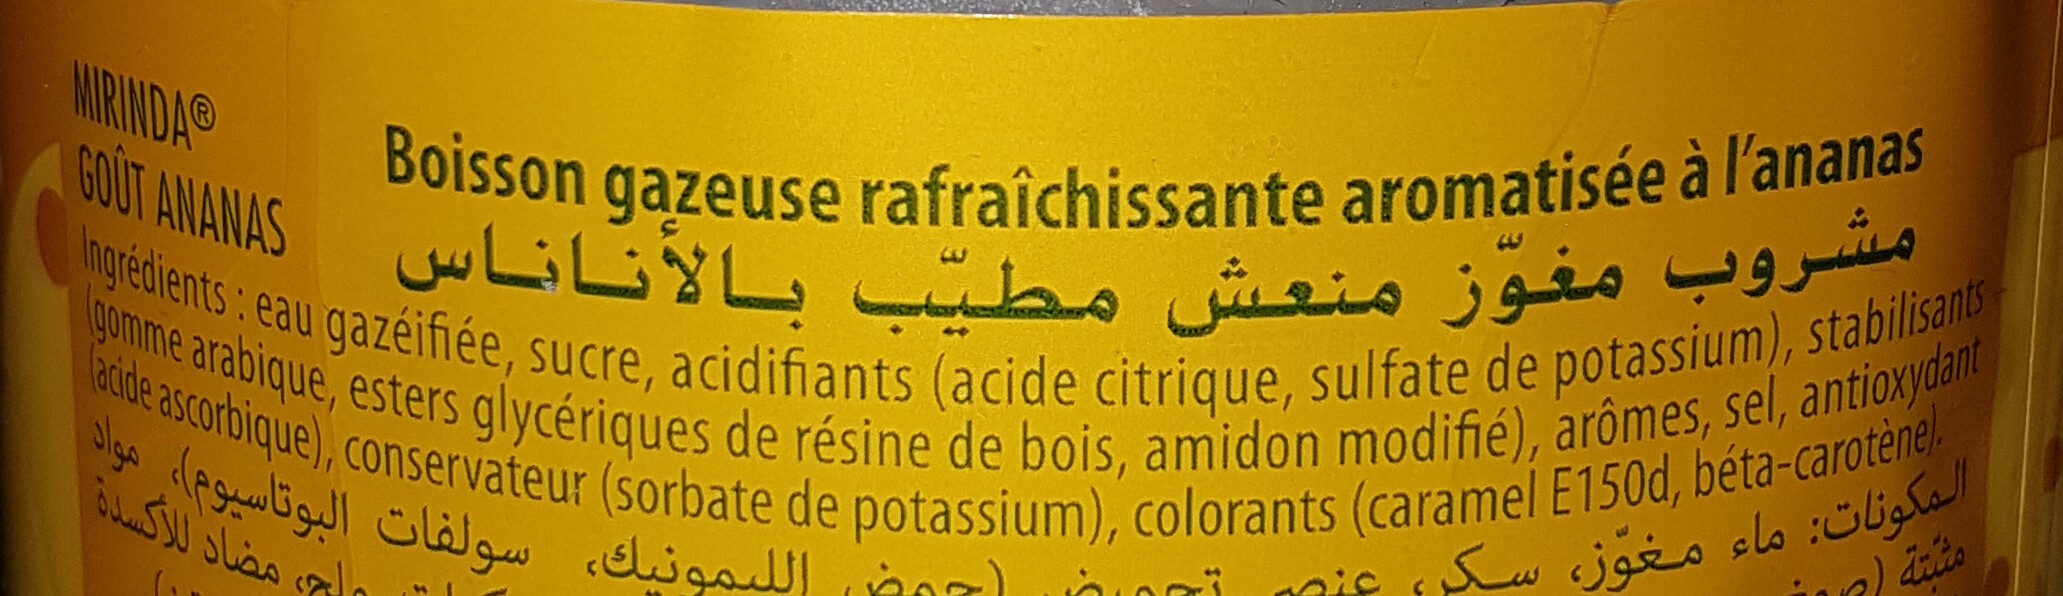 Mirinda Boisson gazeuse goût ananas 2 L - Ingredienti - fr